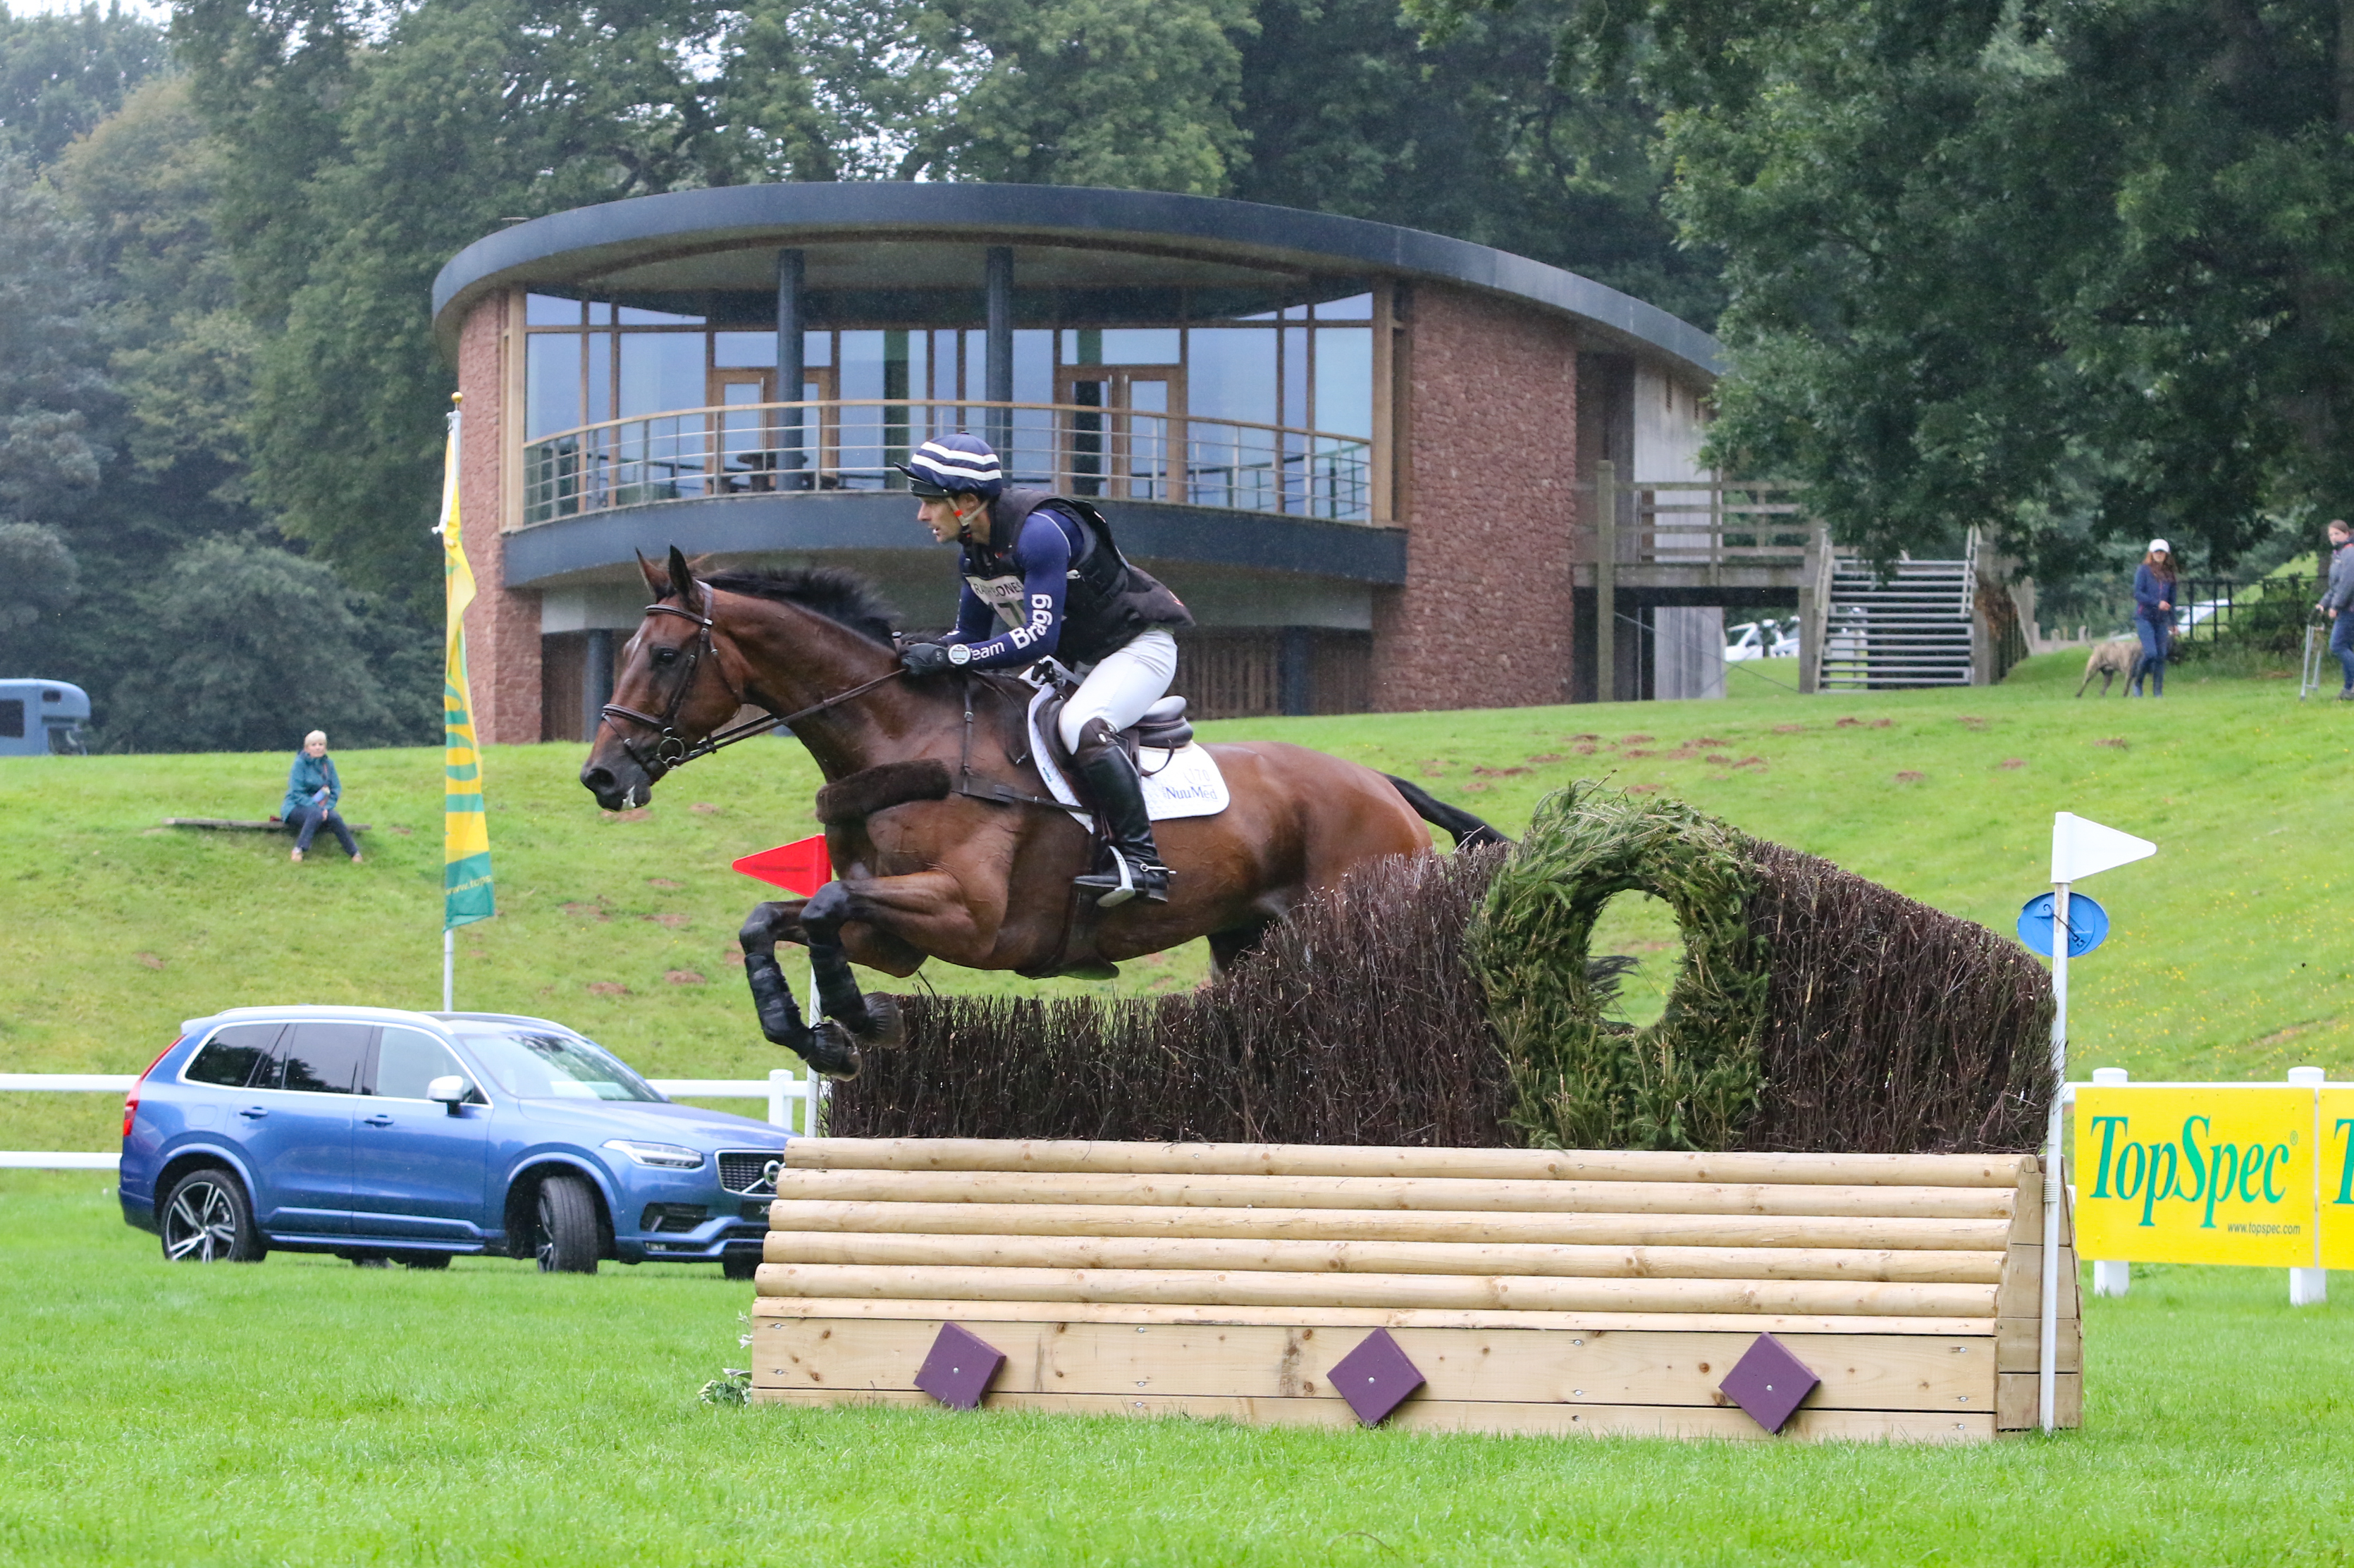 Somerset riders dominate at Bicton Arena International Horse Trials